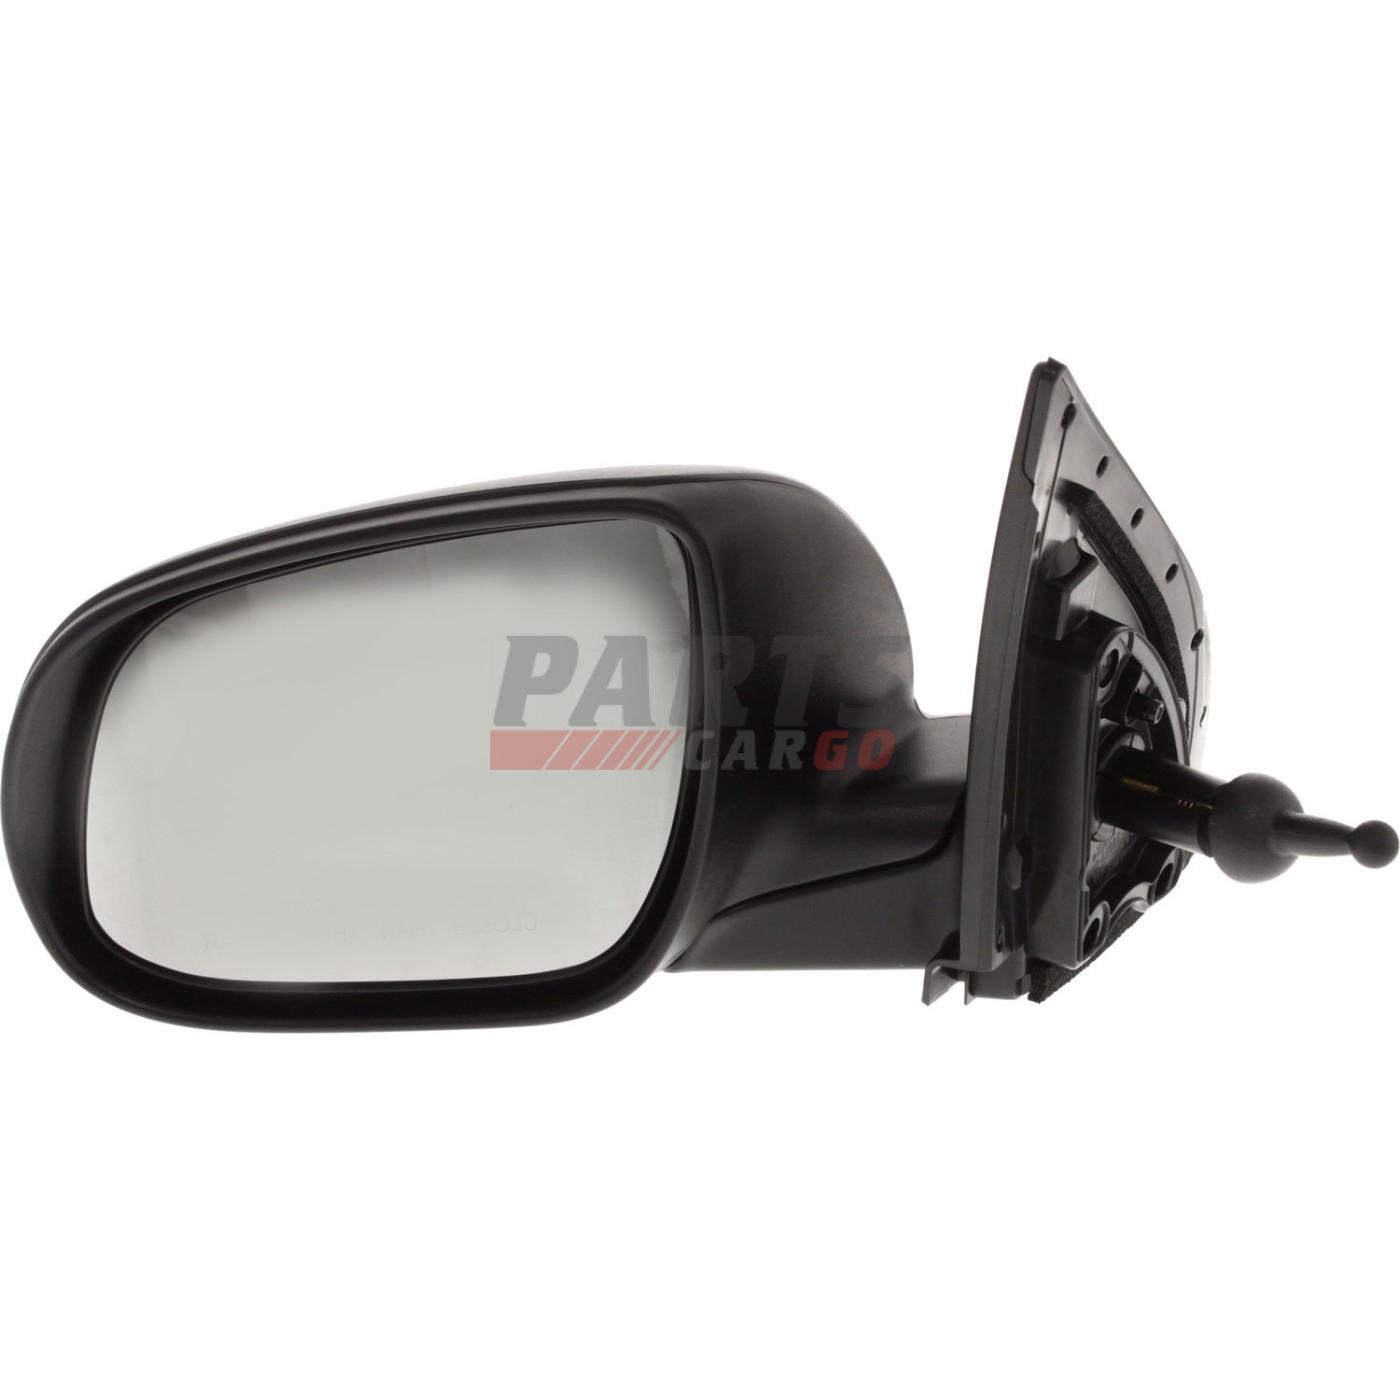 Manual Mirror For 2015-2019 Chevrolet Colorado Right Manual Fold Textured Black